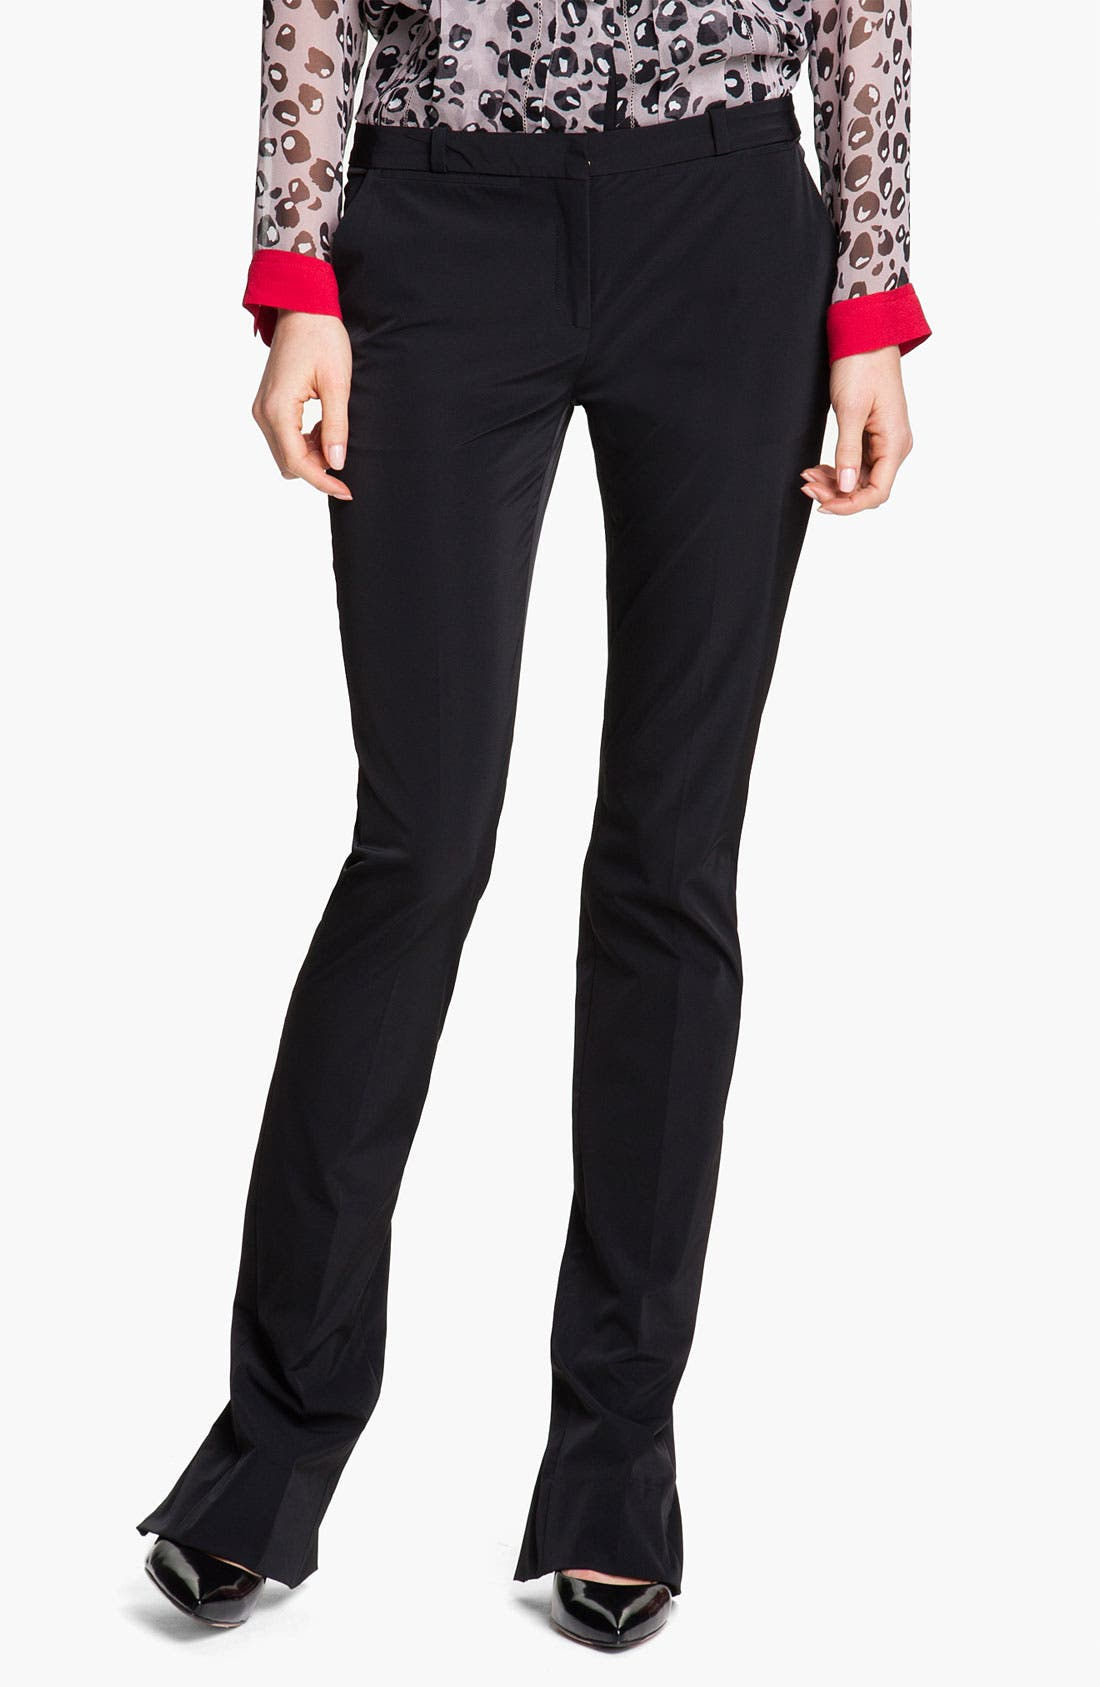 Alternate Image 1 Selected - Diane von Furstenberg 'Annabelle' Zip Hem Pants